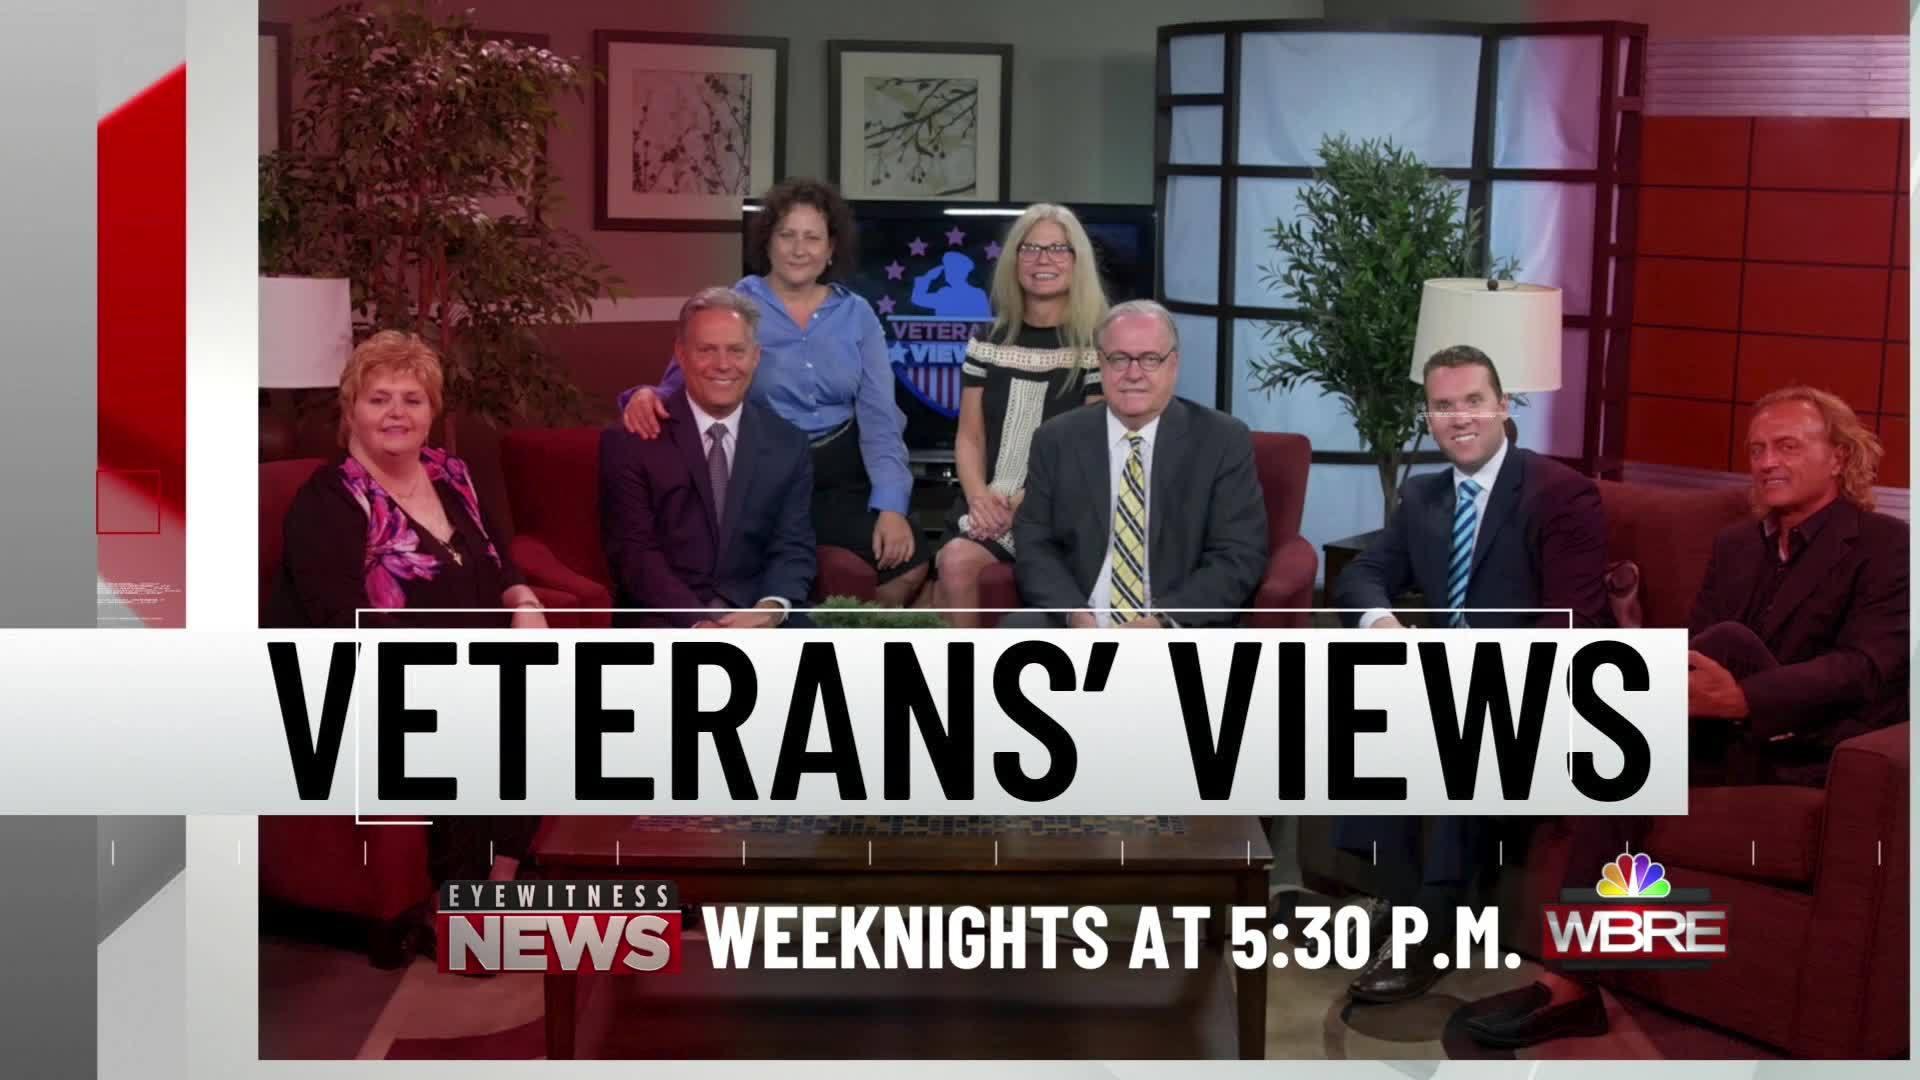 Veterans_Views_Promo_5_20190311170212